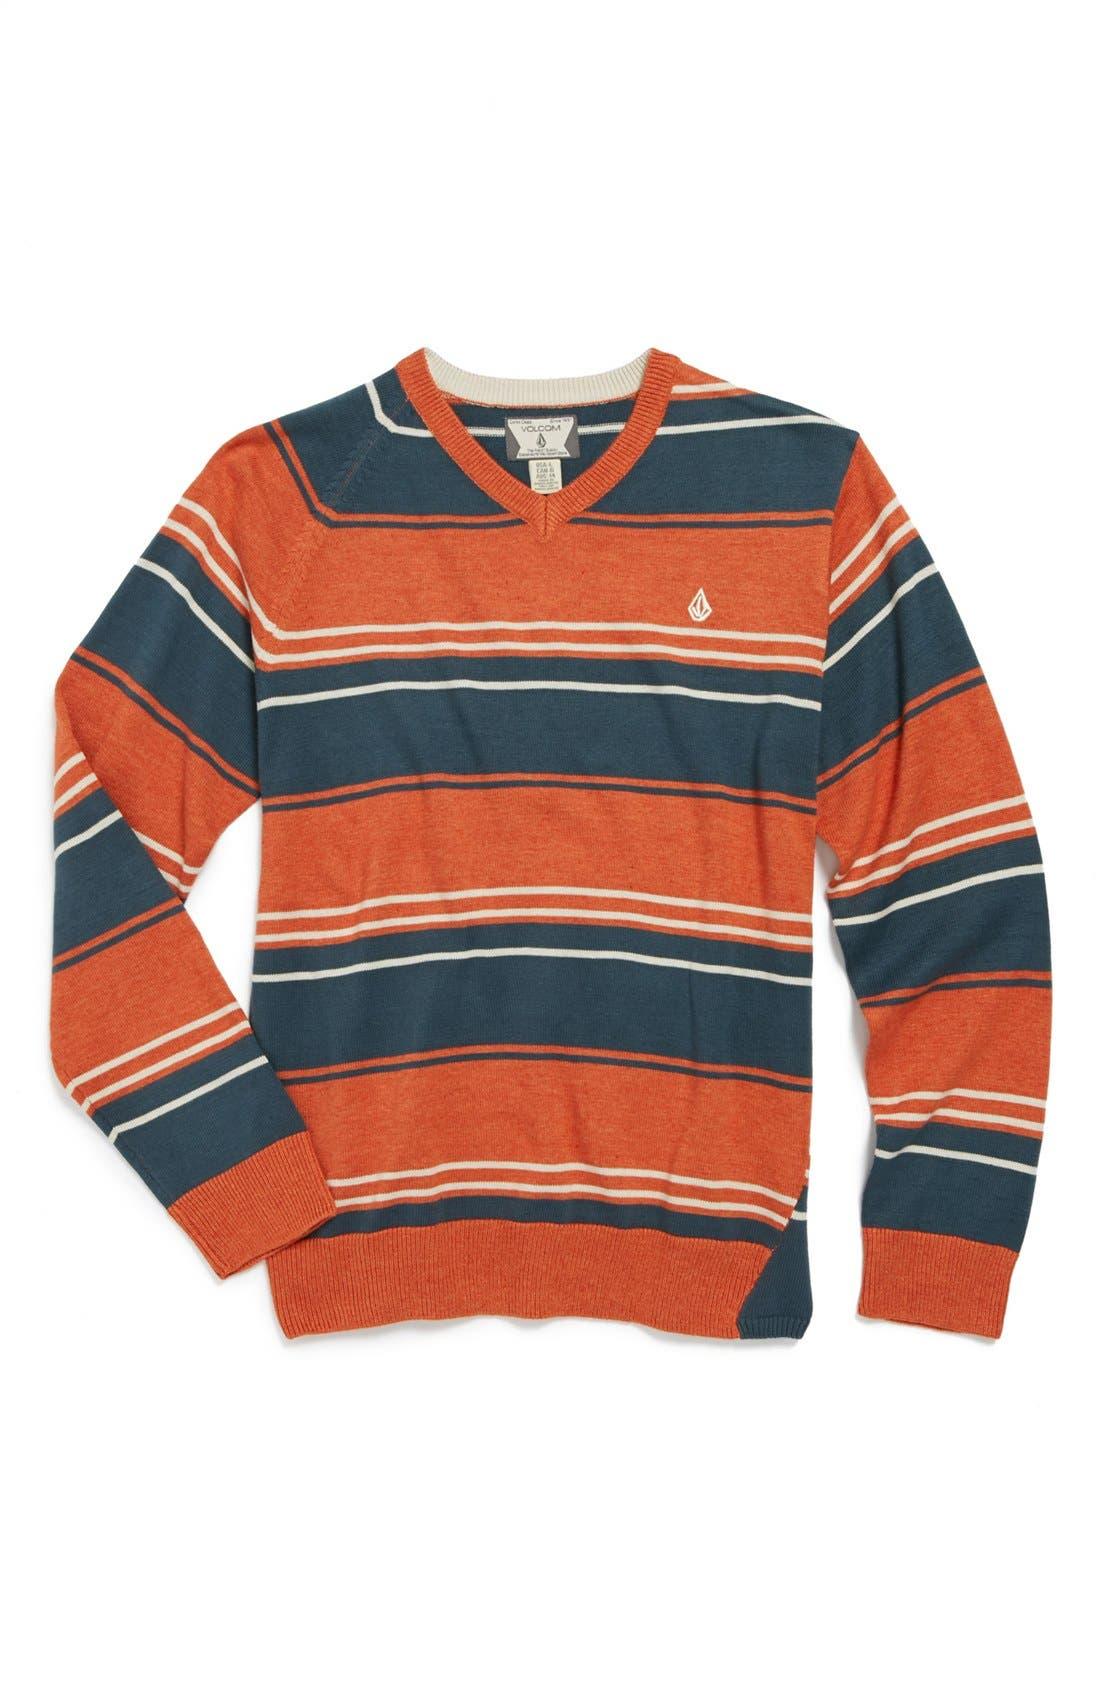 Alternate Image 1 Selected - Volcom 'Understated' Stripe V-Neck Sweater (Big Boys)